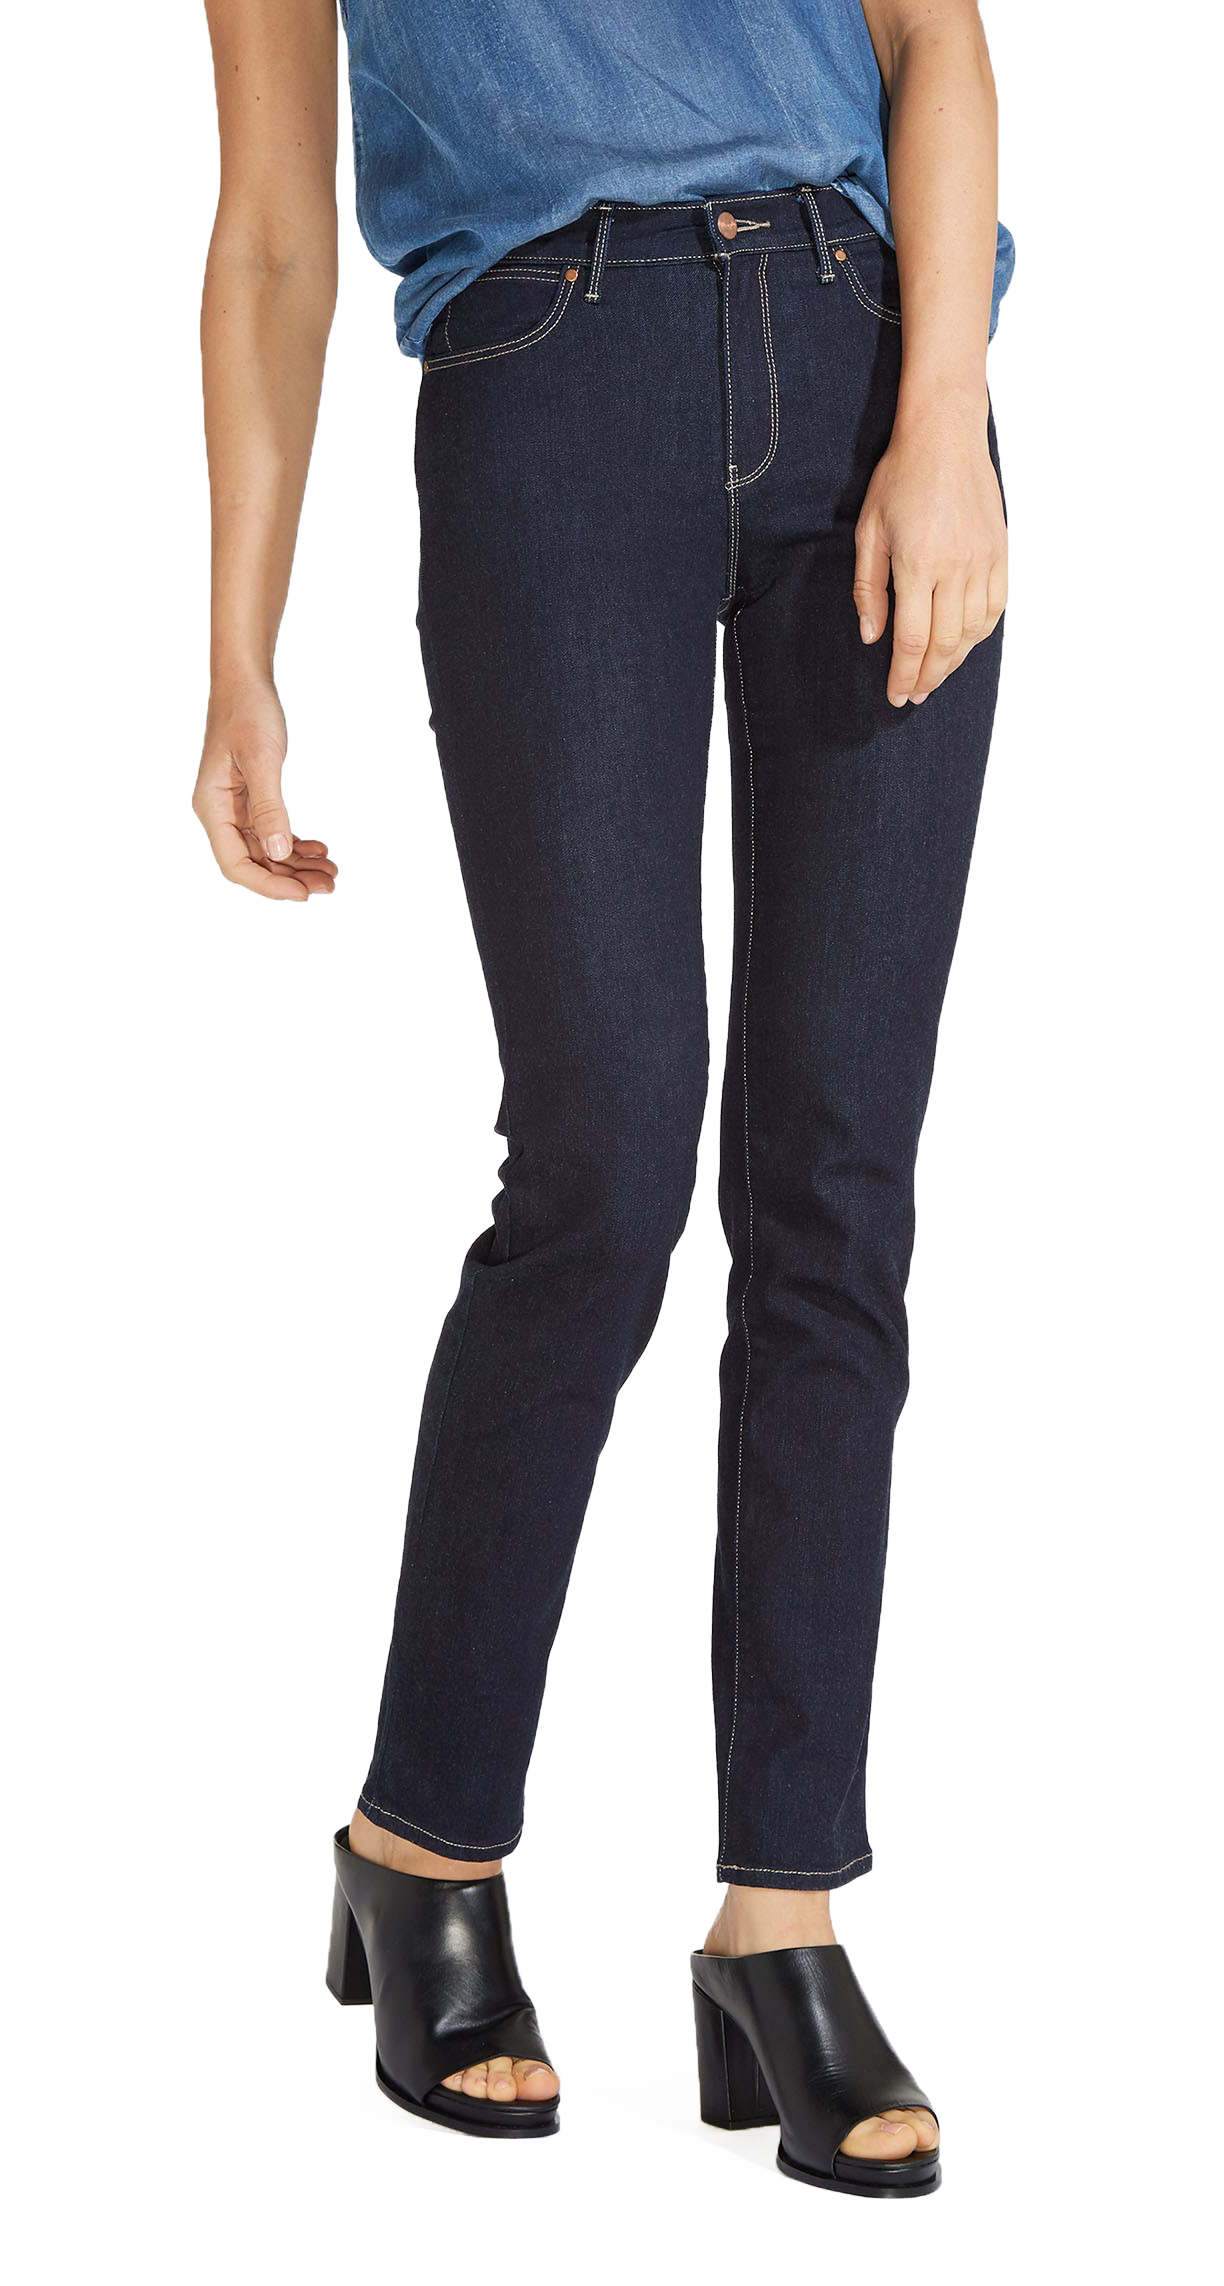 Wrangler High Rise Slim Ulta Flex Stretch Jeans Womens Ladies Rinsewash Denim